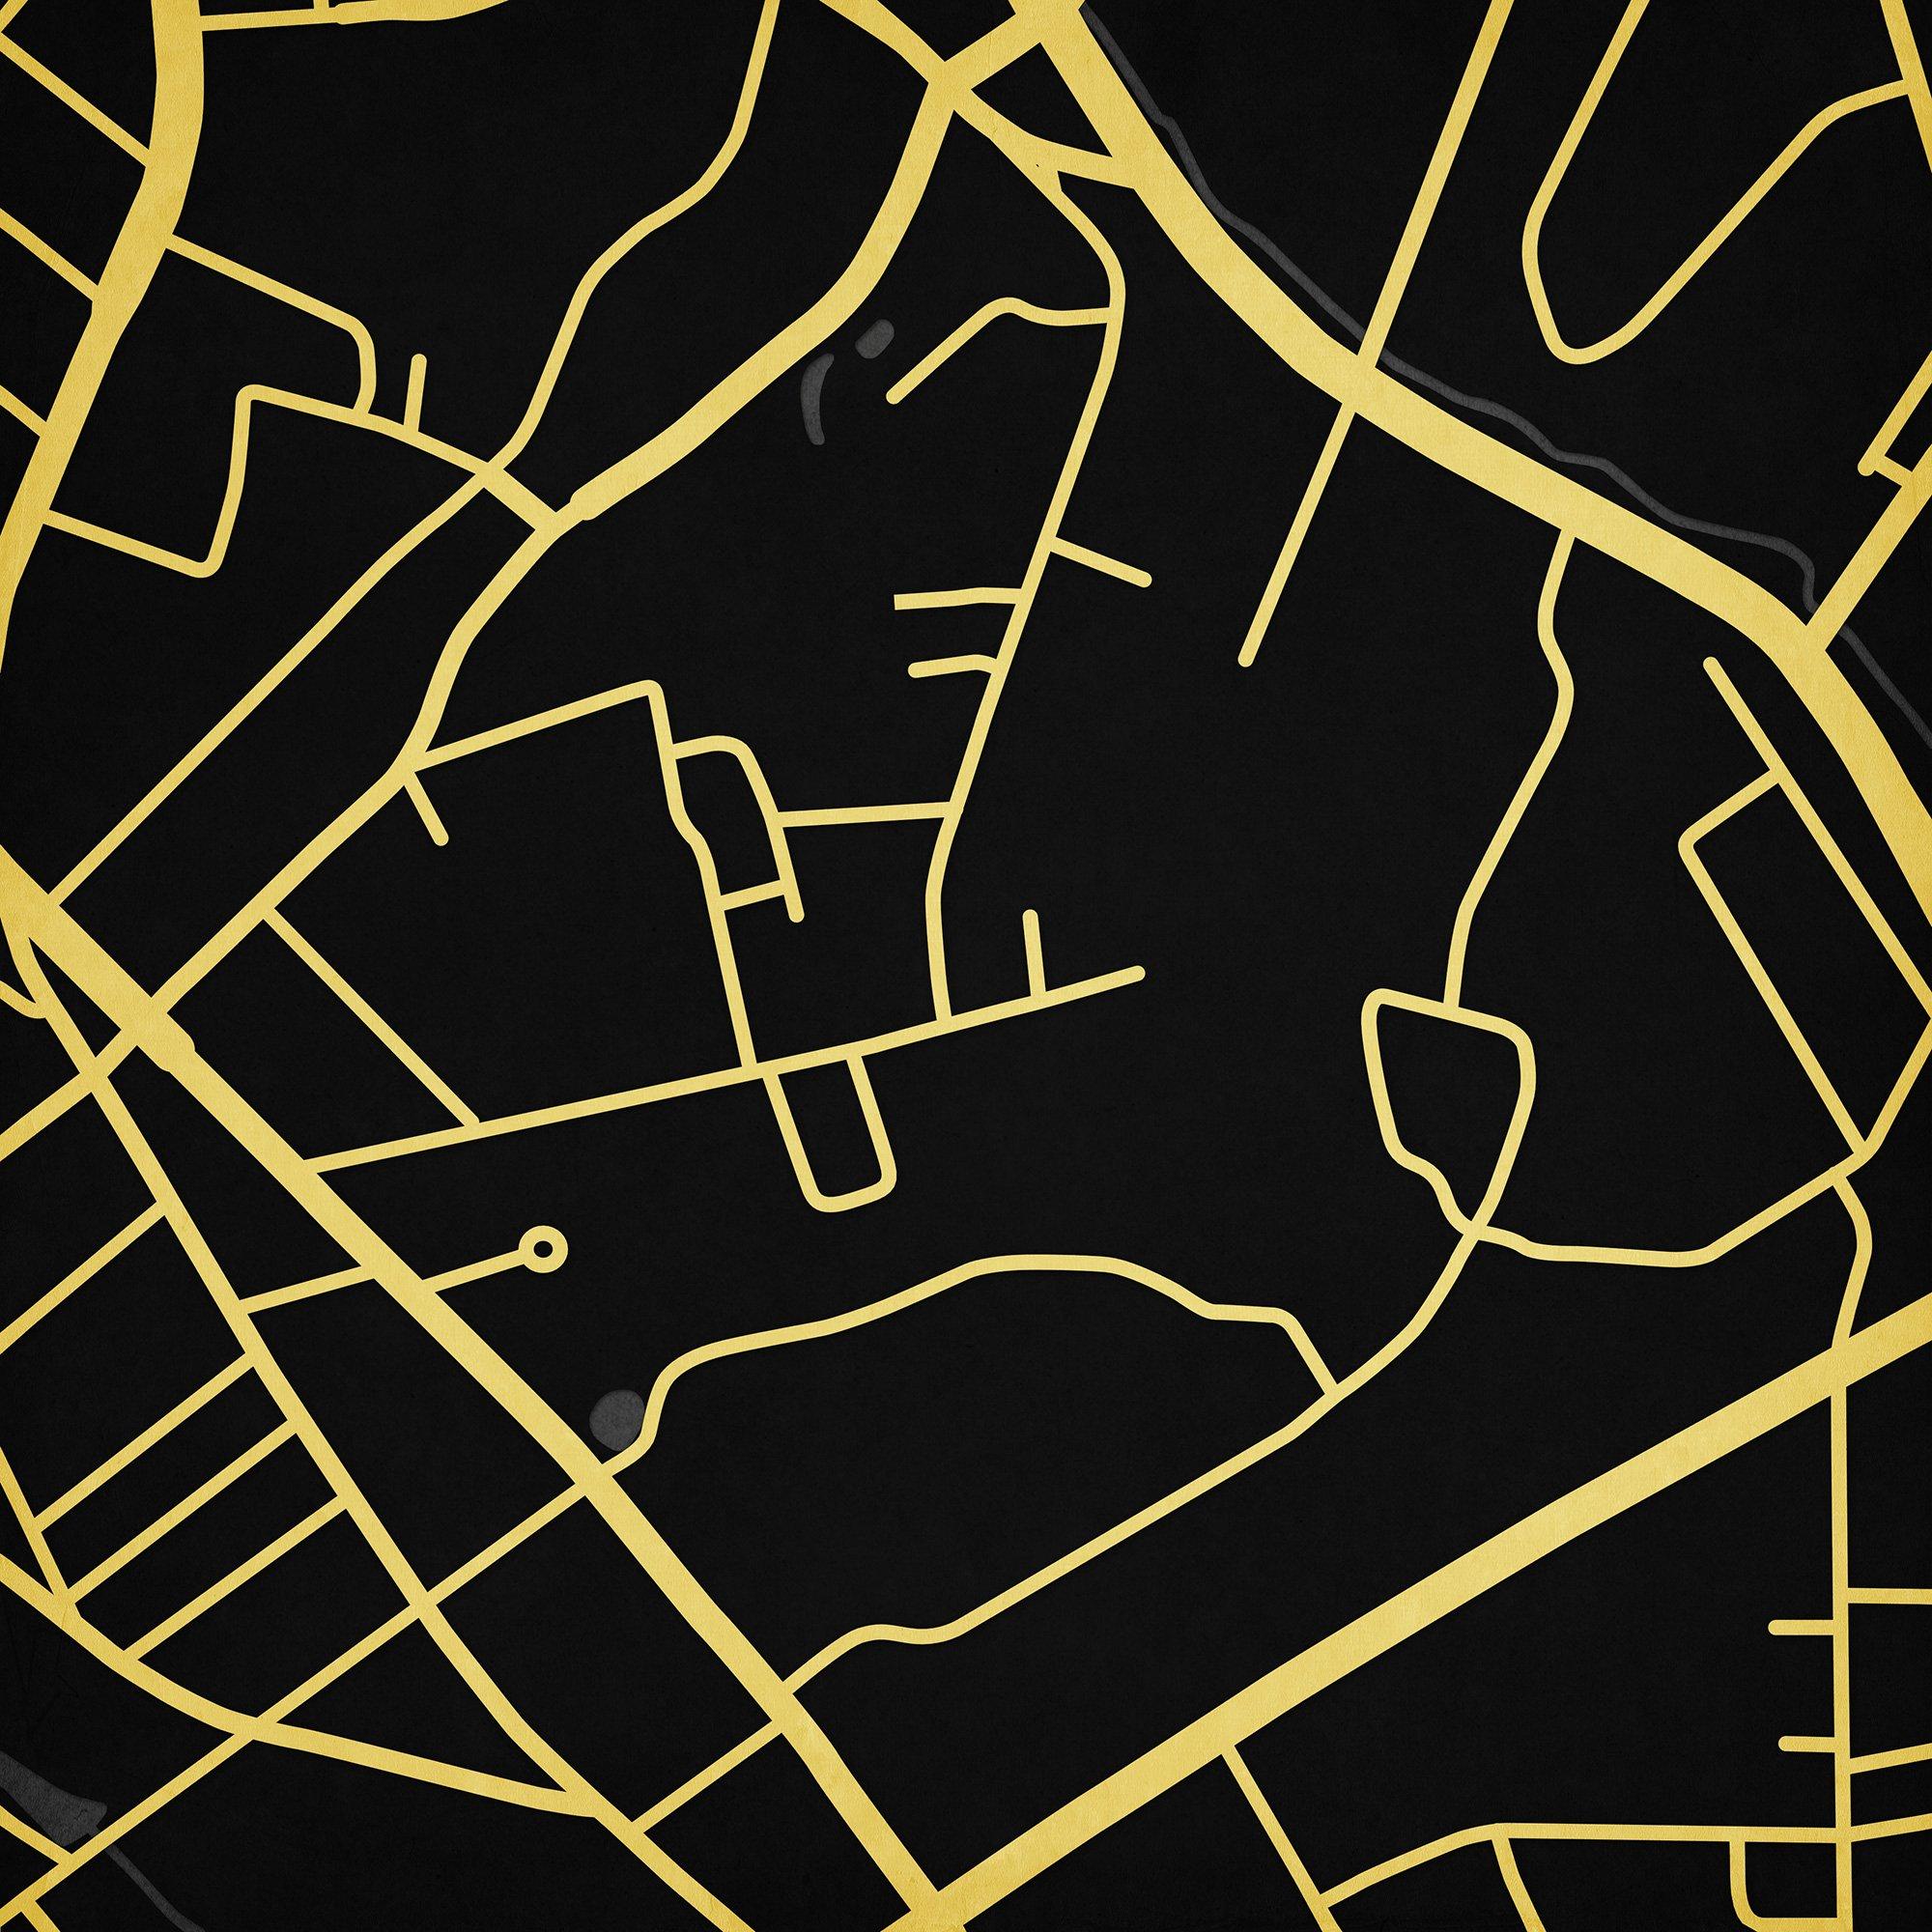 Wofford College Campus Map Art, Unframed 12'' x 12''